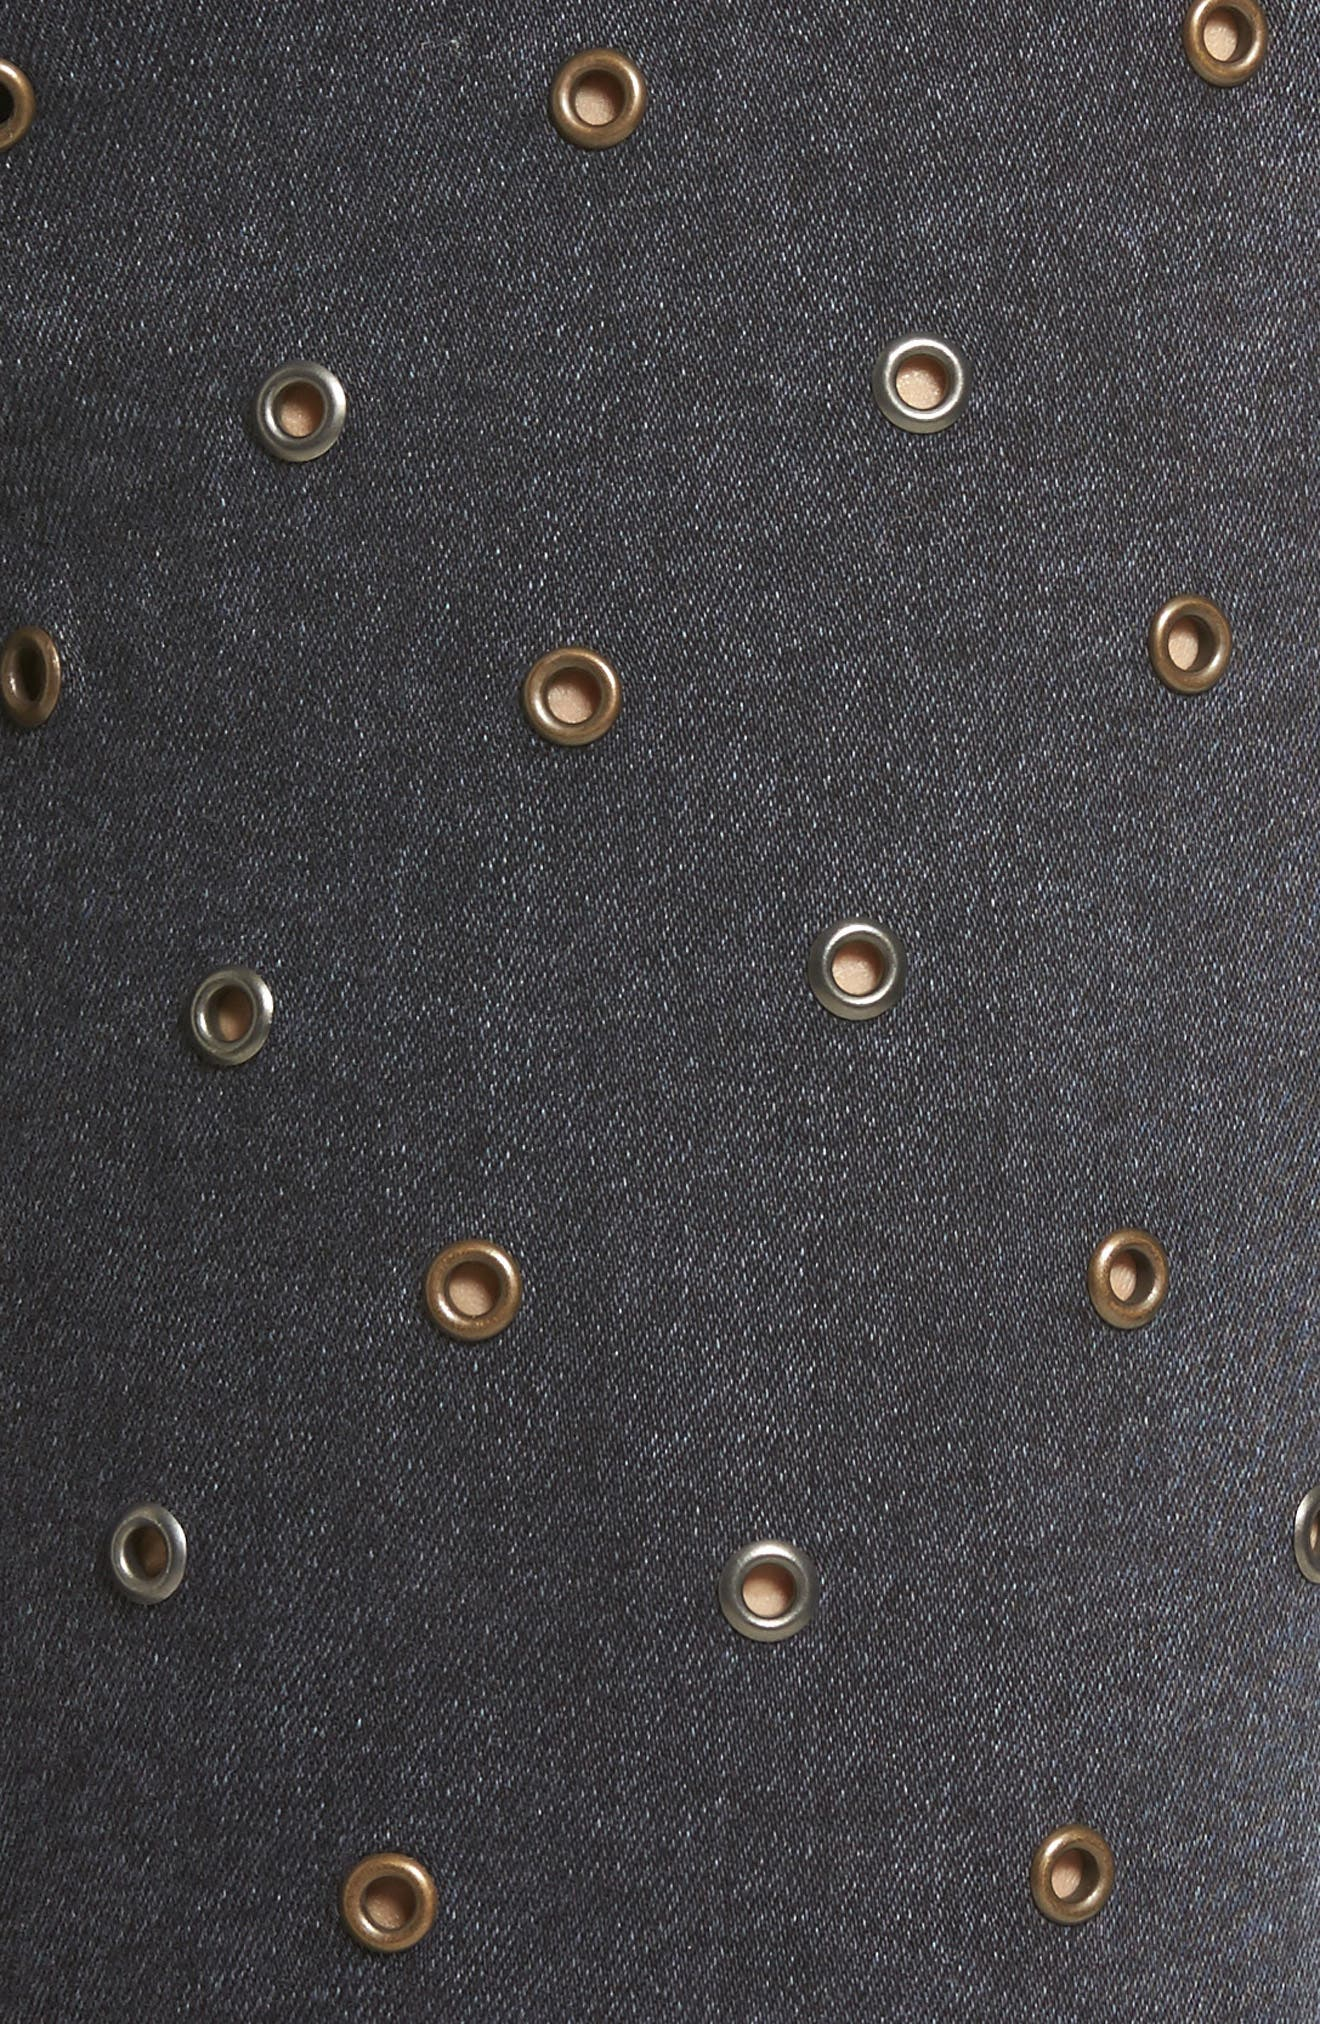 Jamie Grommet Ankle Skinny Jeans,                             Alternate thumbnail 6, color,                             Washed Black